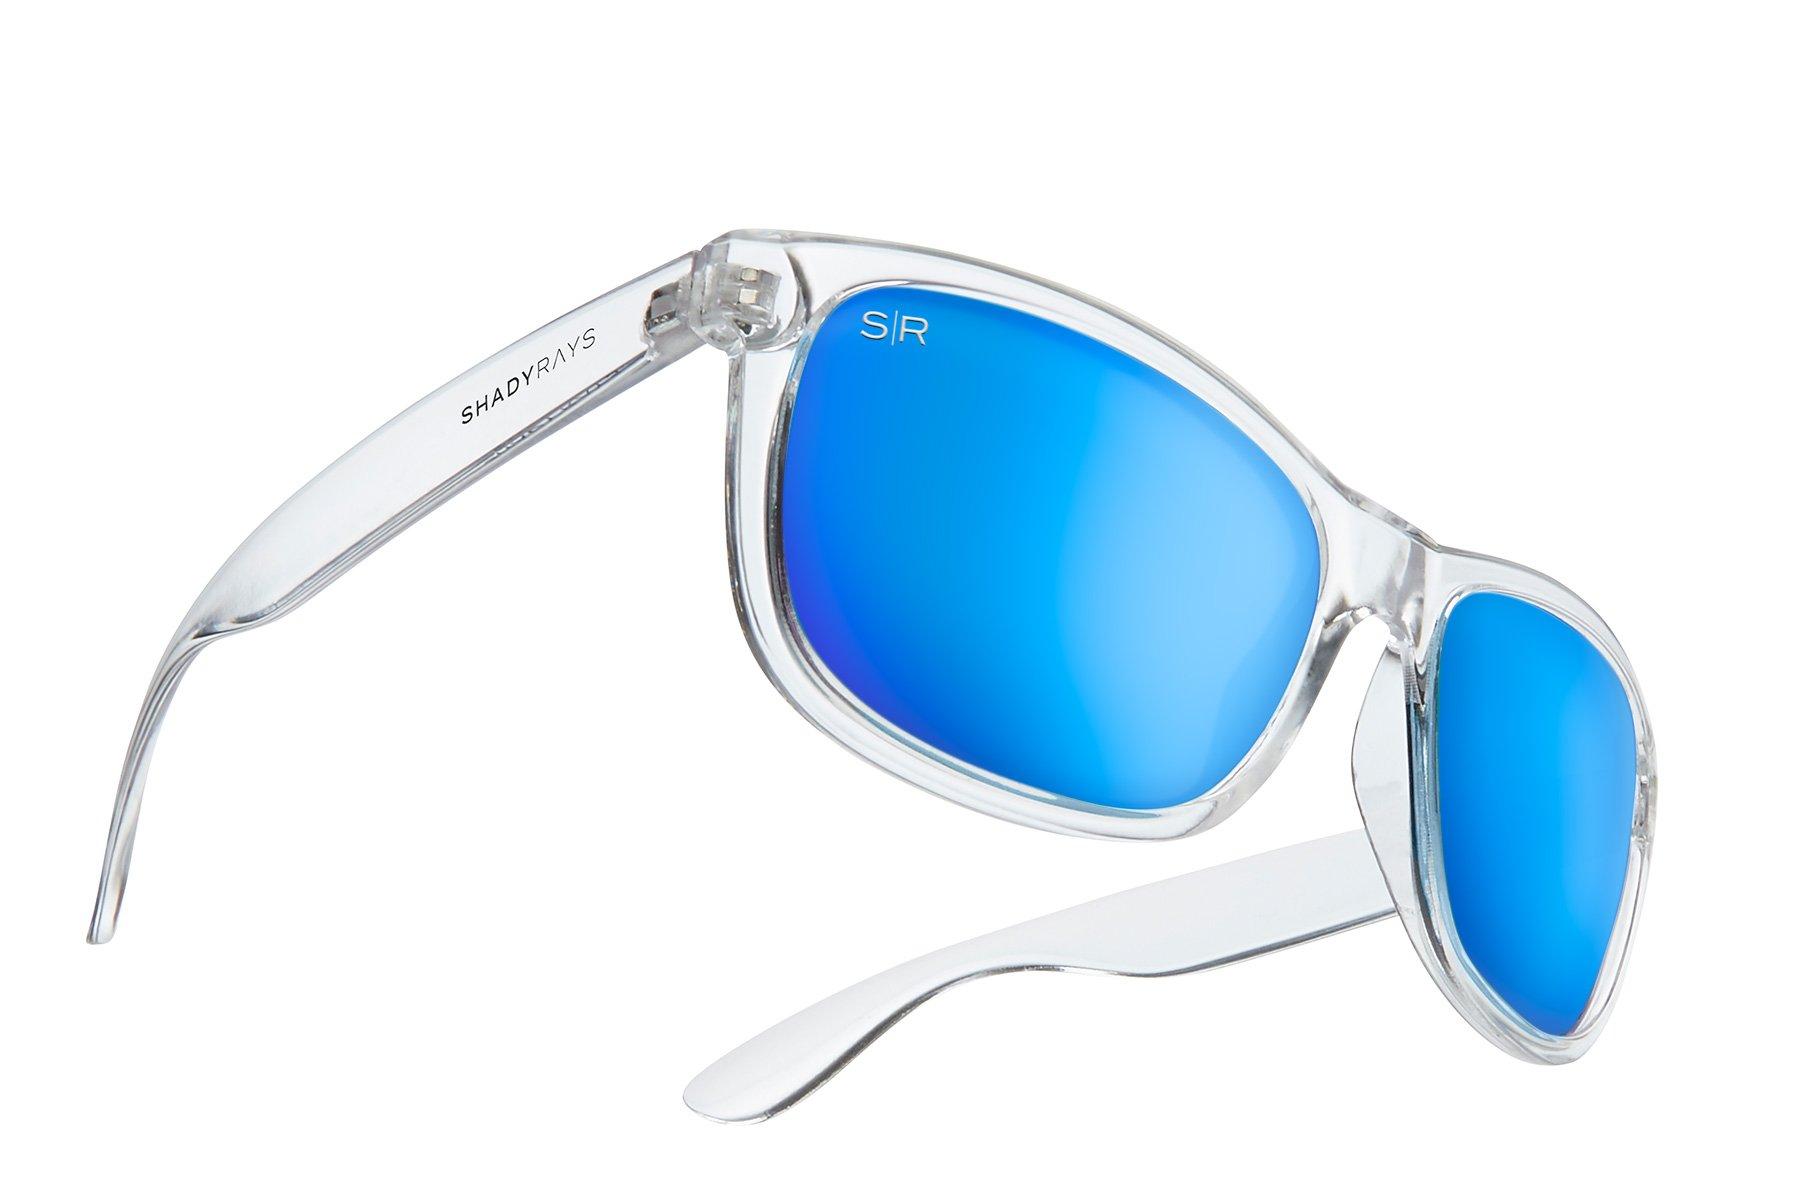 Shady Rays Signature Series Polarized Sunglasses Glacier, Ice